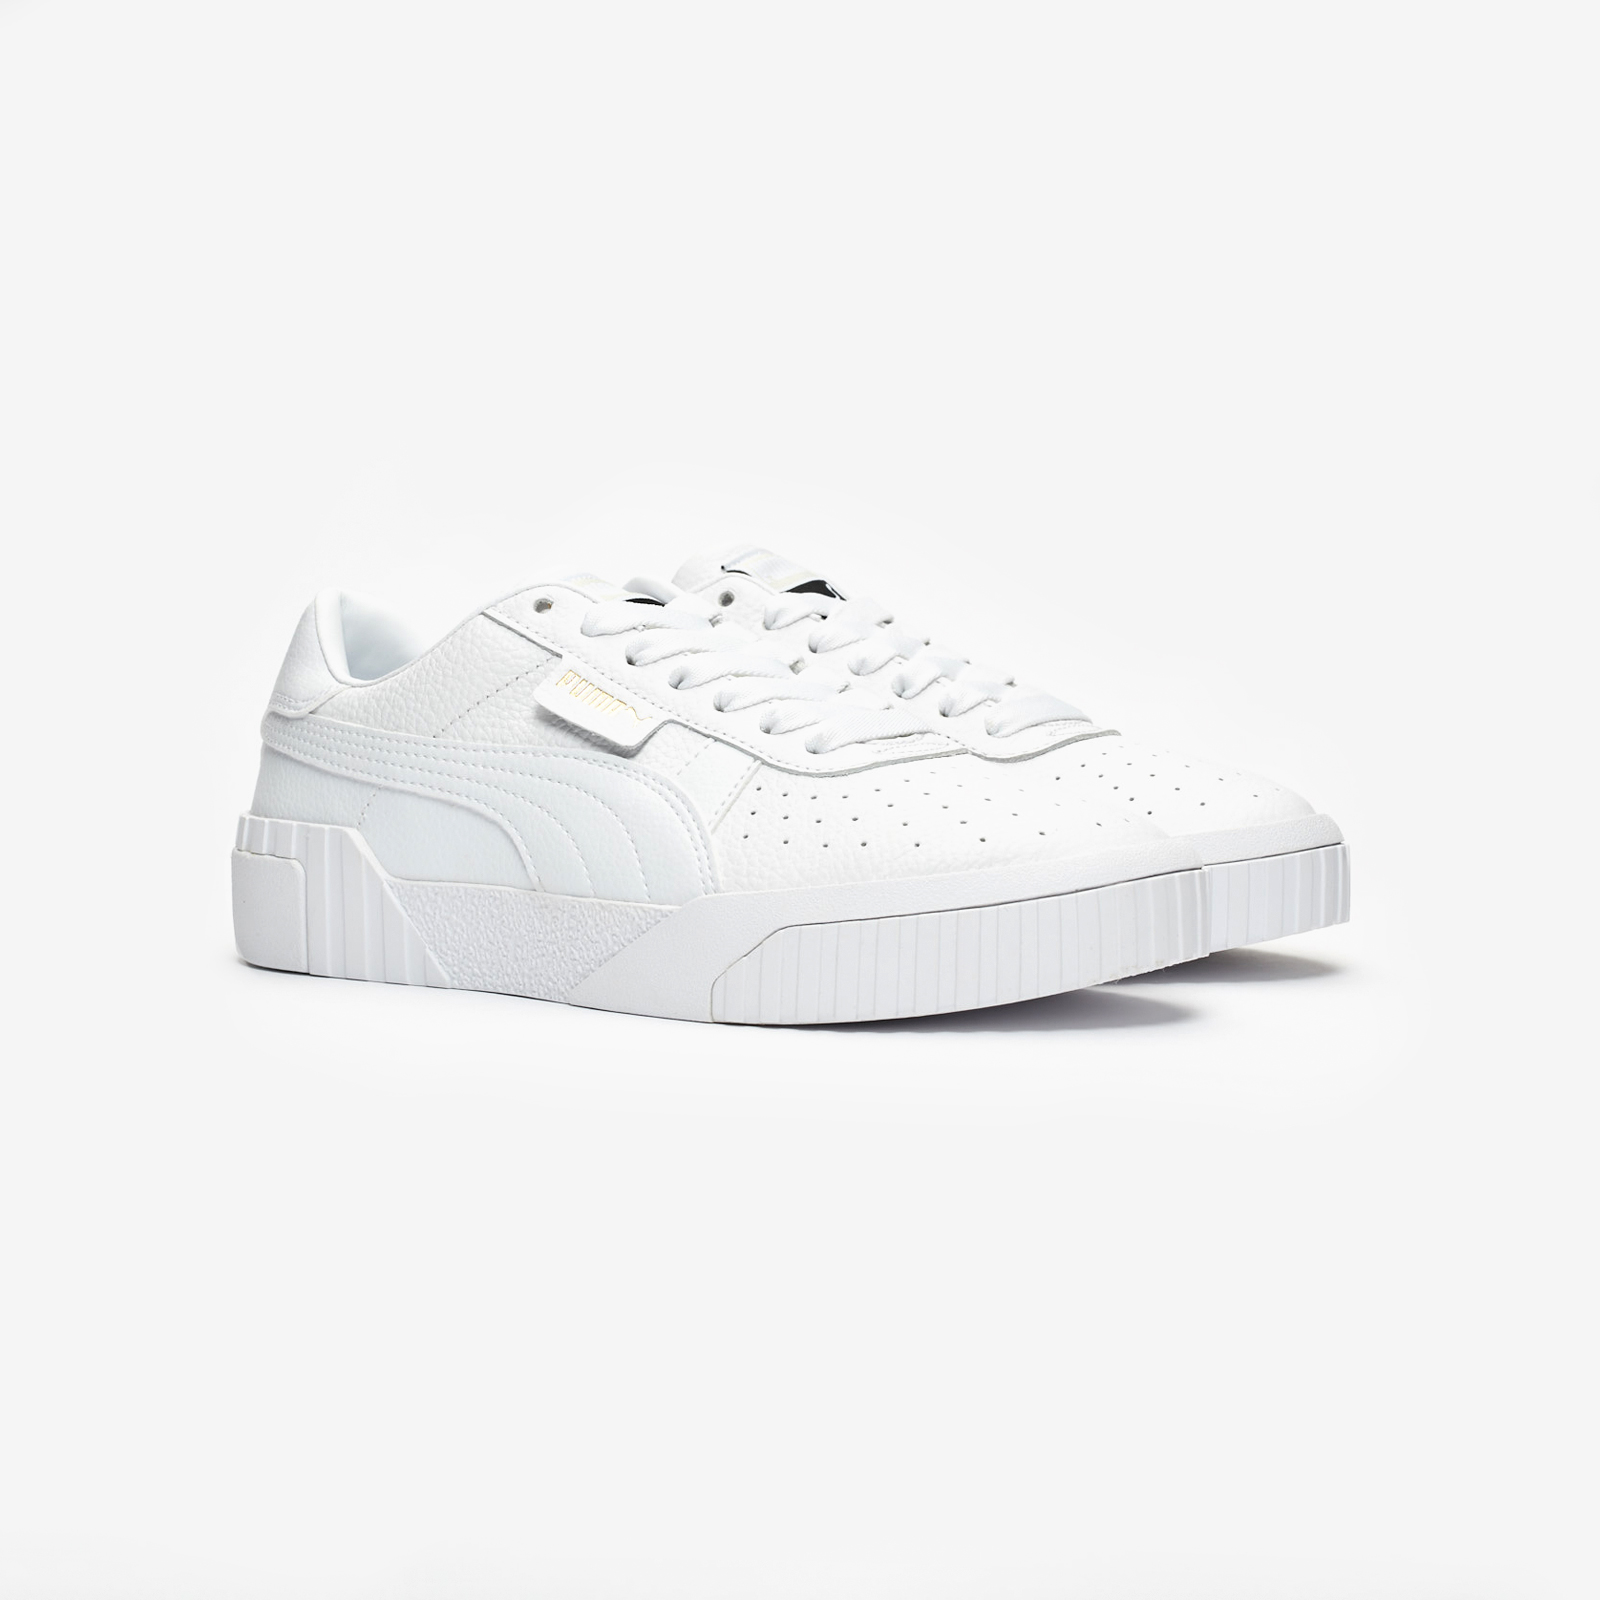 Puma Cali - 369155-01 - Sneakersnstuff